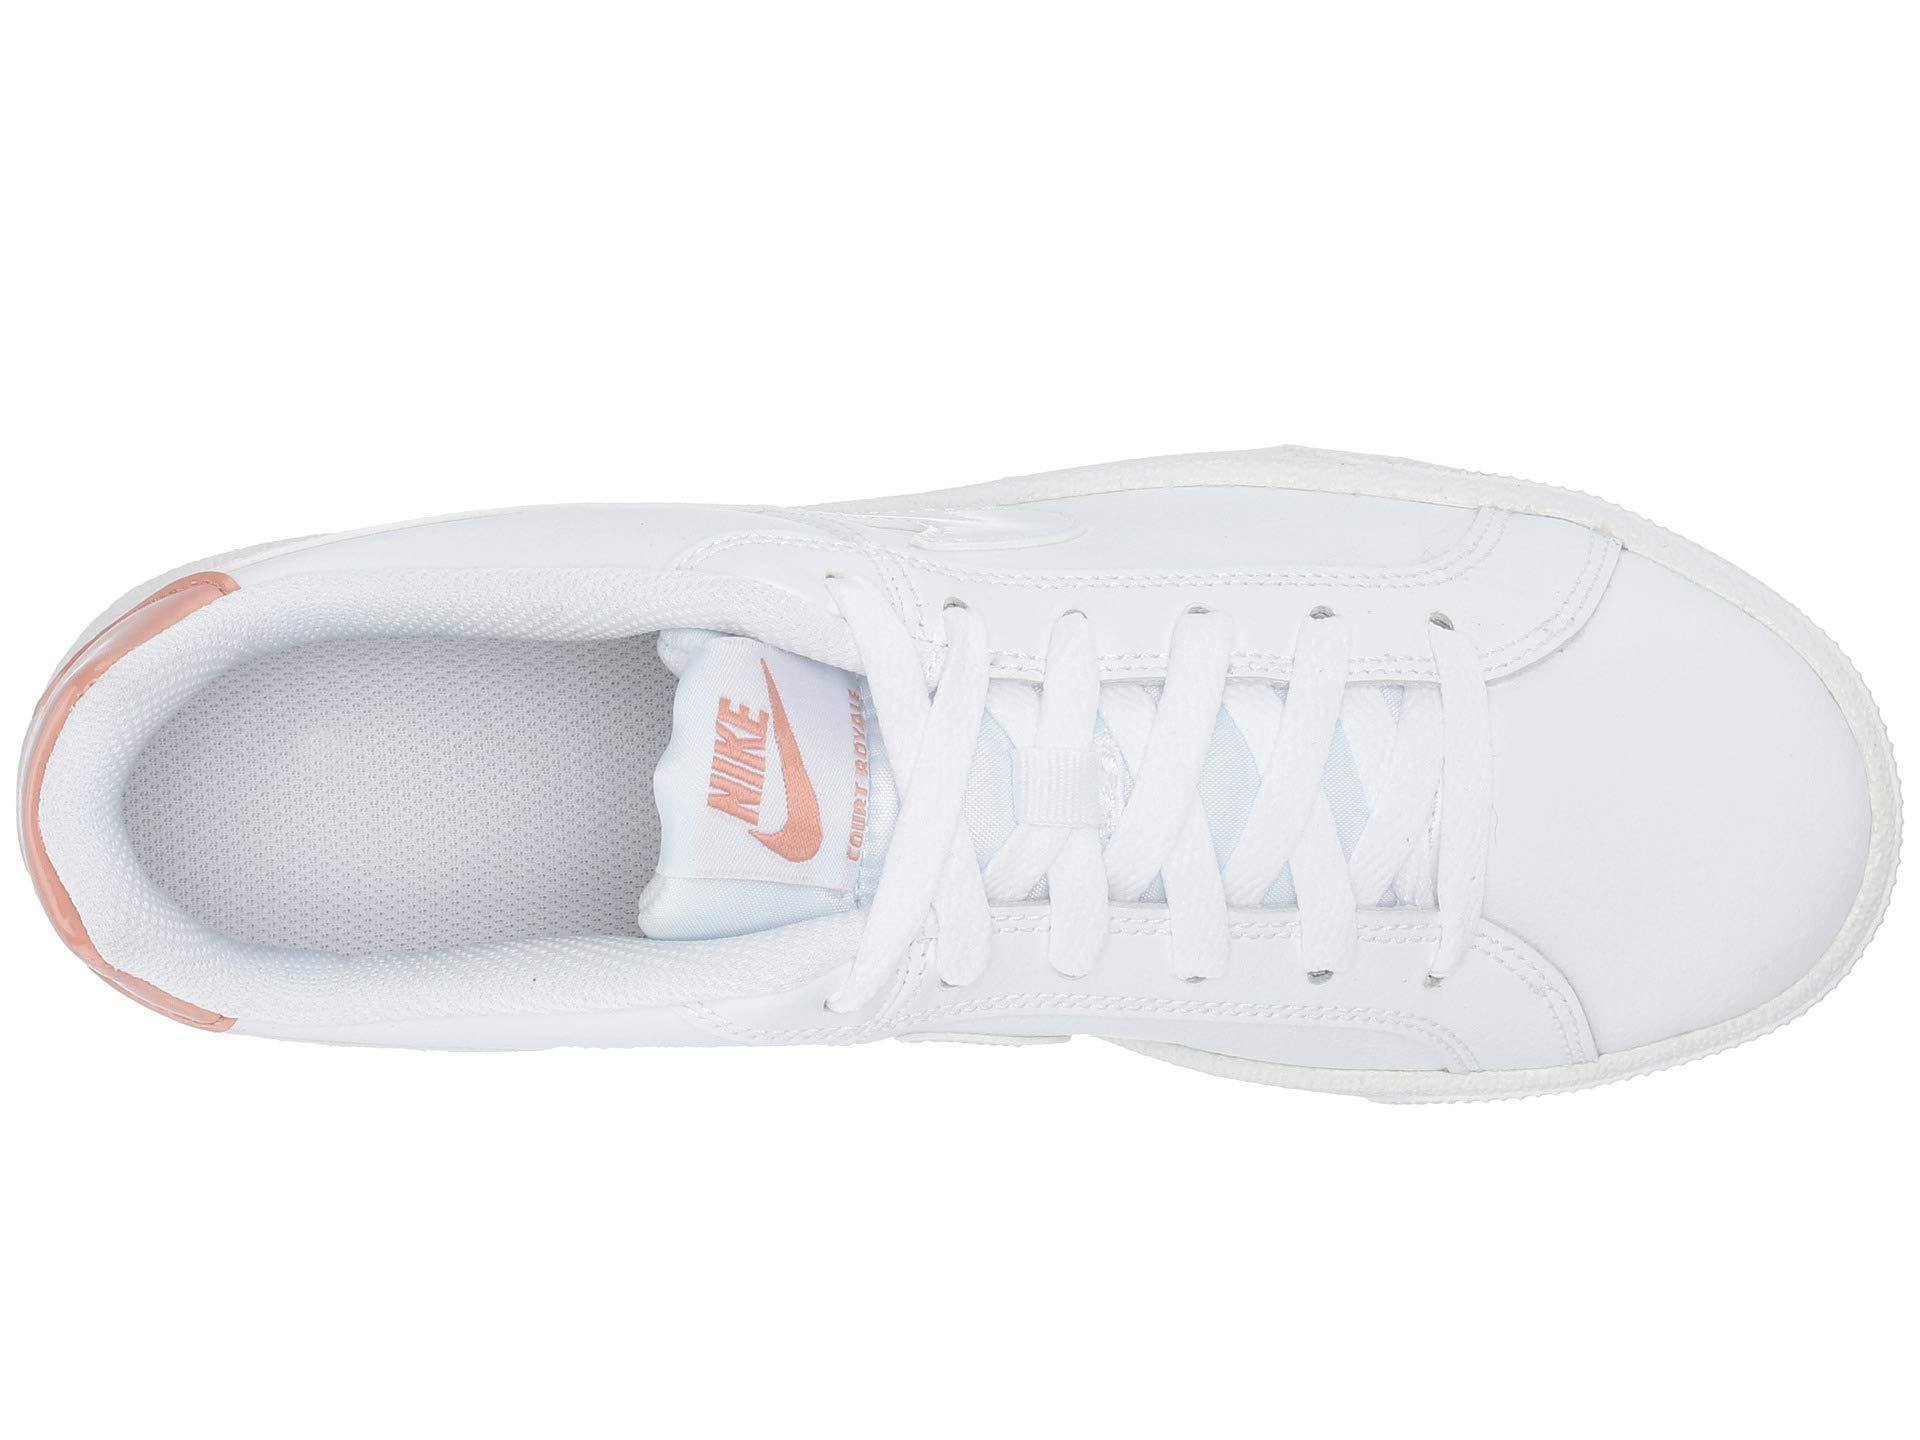 304a781816f806 Lyst - Nike Court Royale (oil Grey oil Grey light Cream white ...